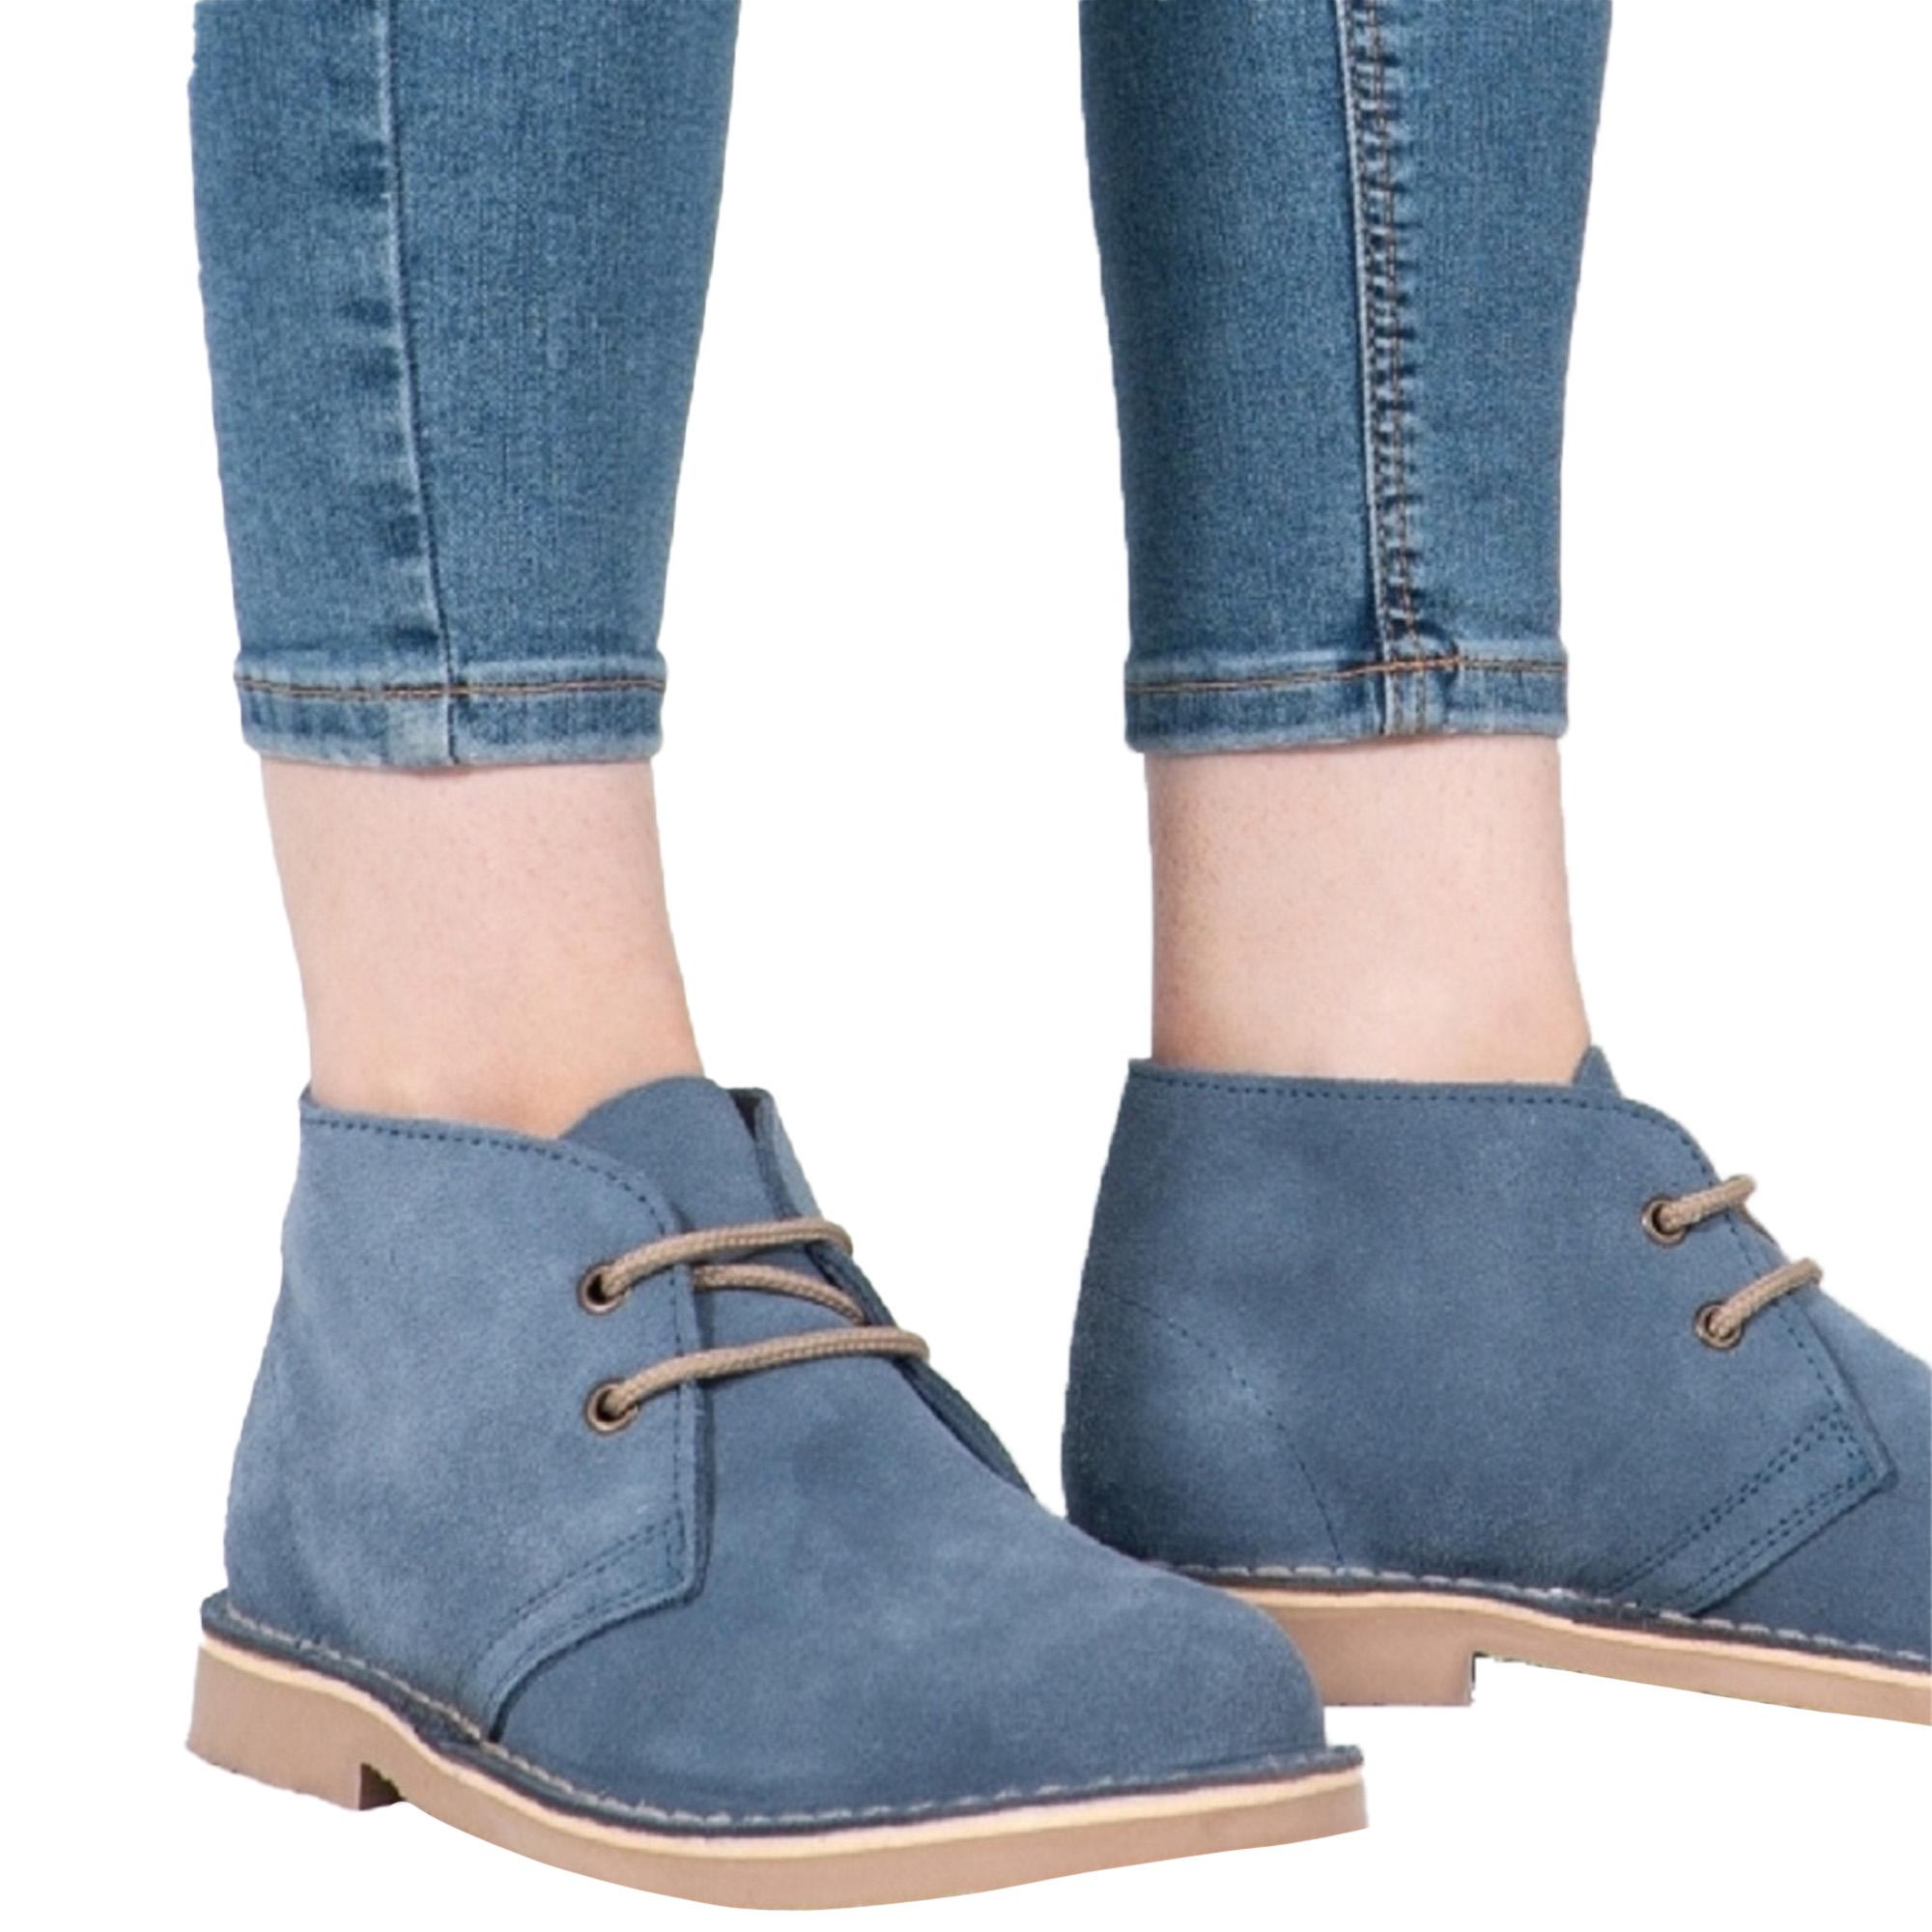 Roamers Womens/Ladies Real Suede Unlined Desert Boots (4 UK) (Denim Blue)